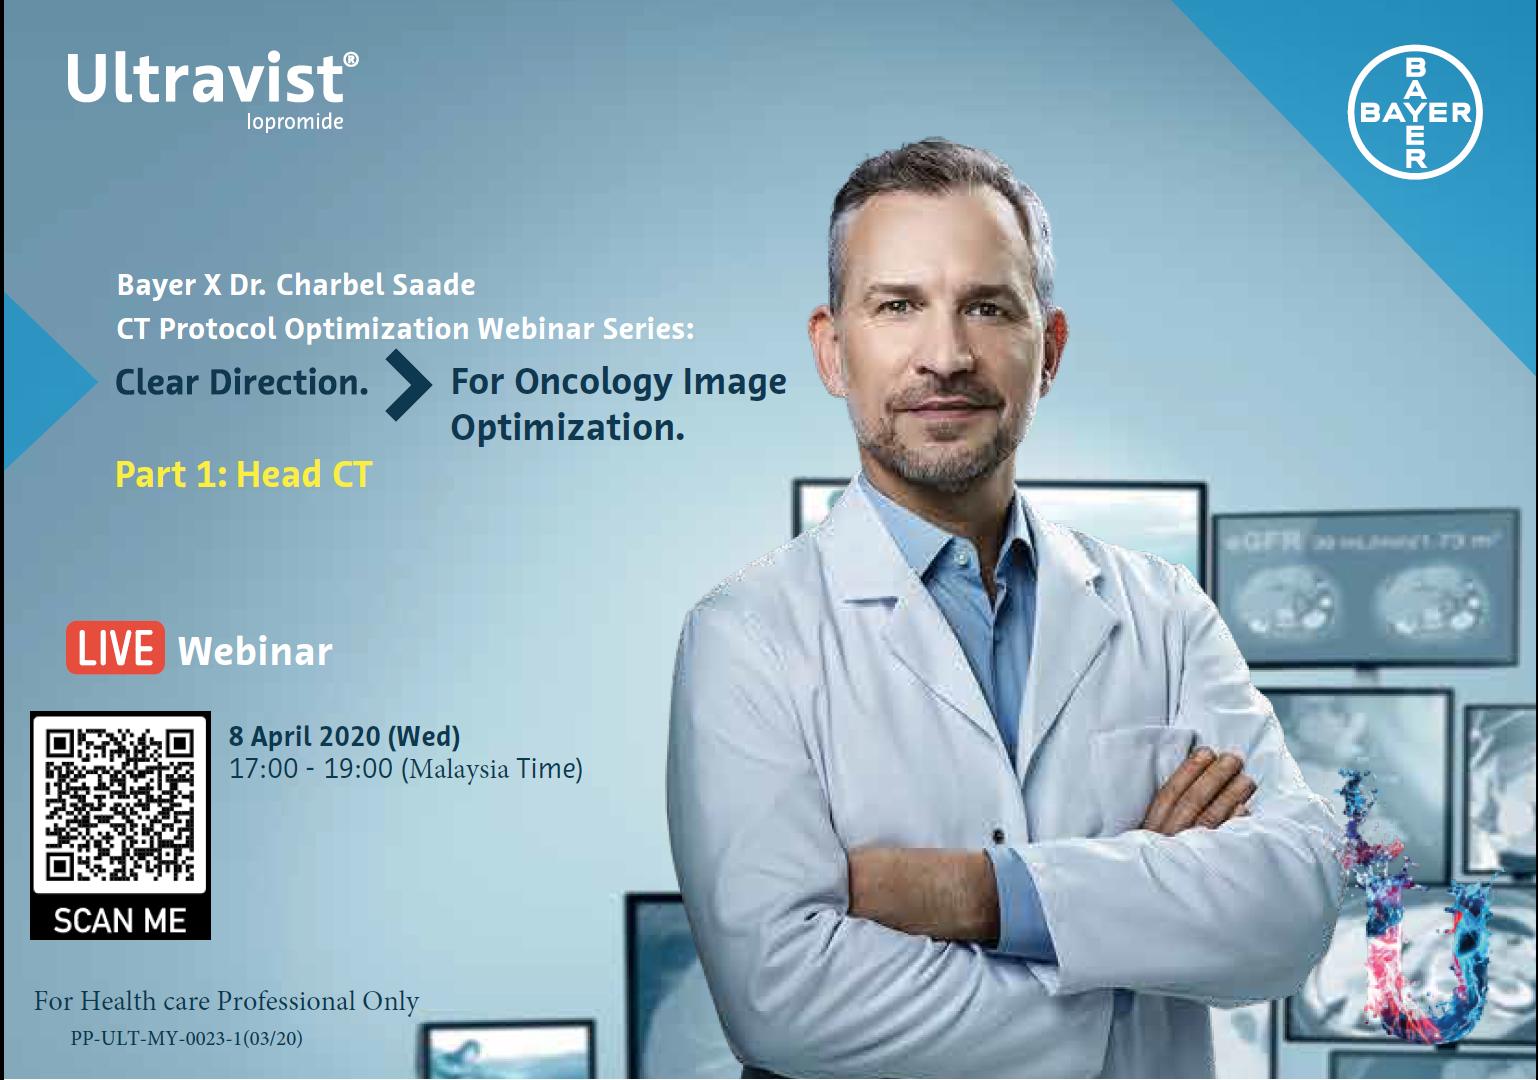 APAC CT Protocol Optimization Webinar_Oncology_Part 1 Head_Final